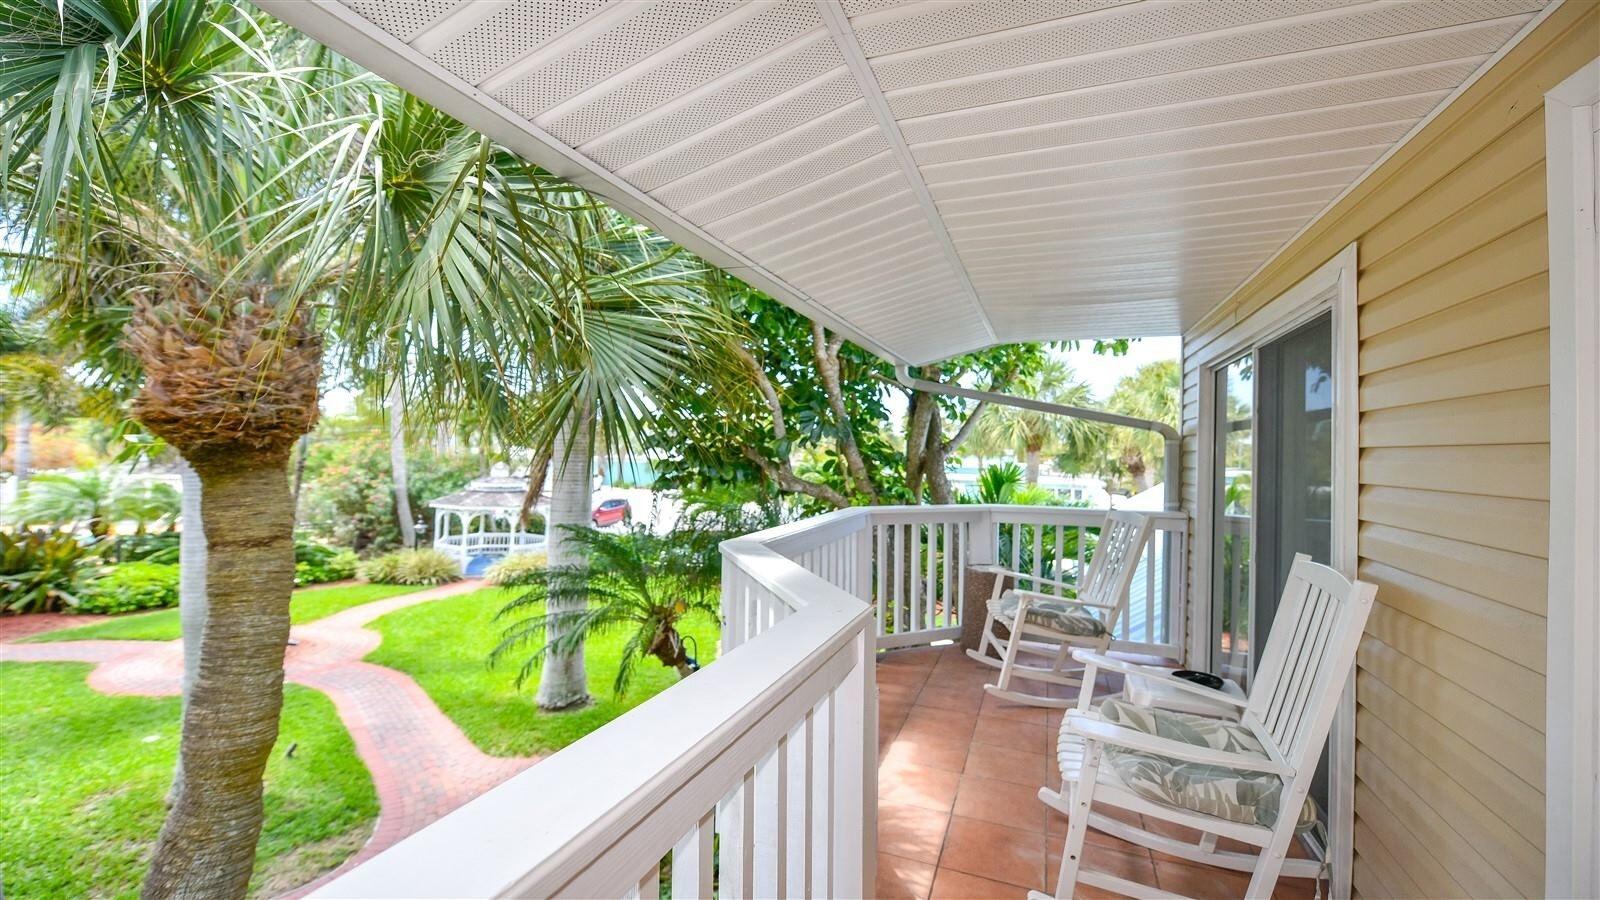 Tropical Breeze Resort And Spa Siesta Key Florida